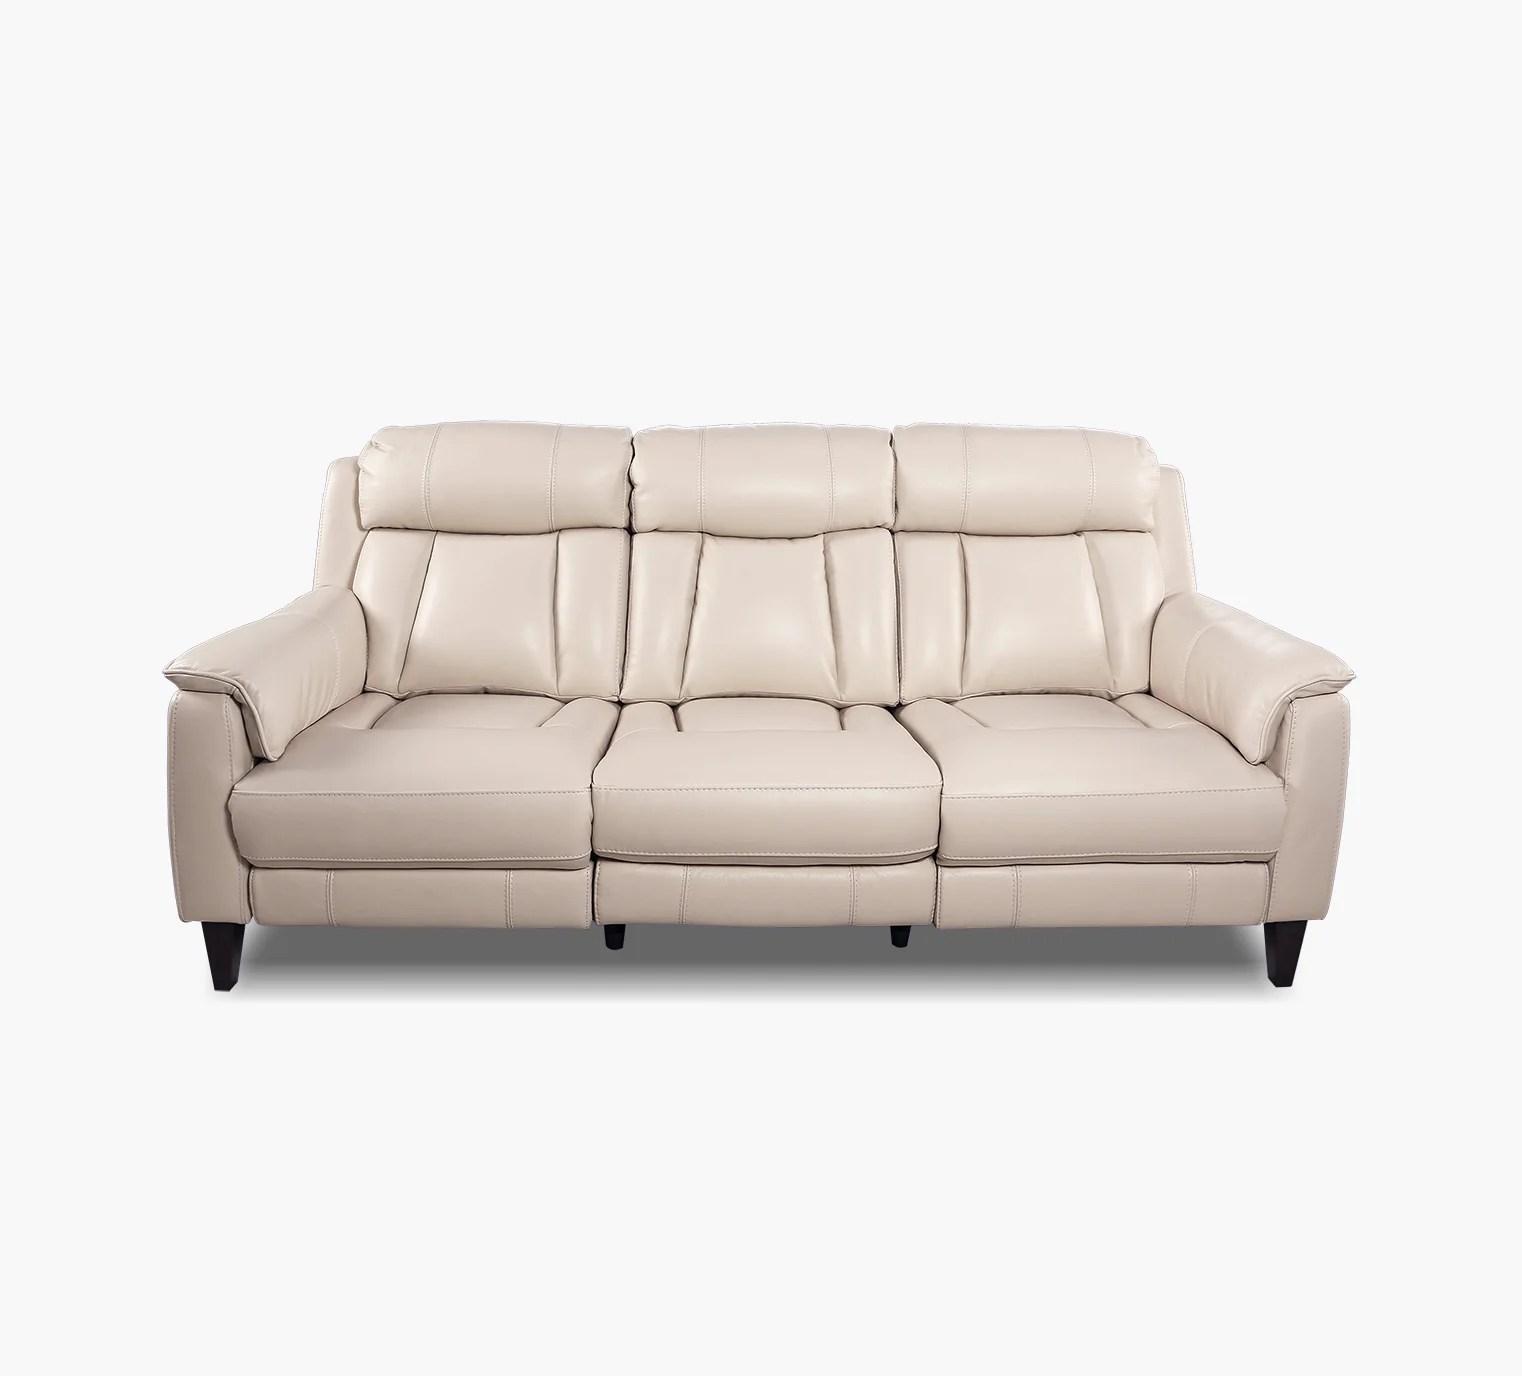 everett ivory leather dual power reclining sofa